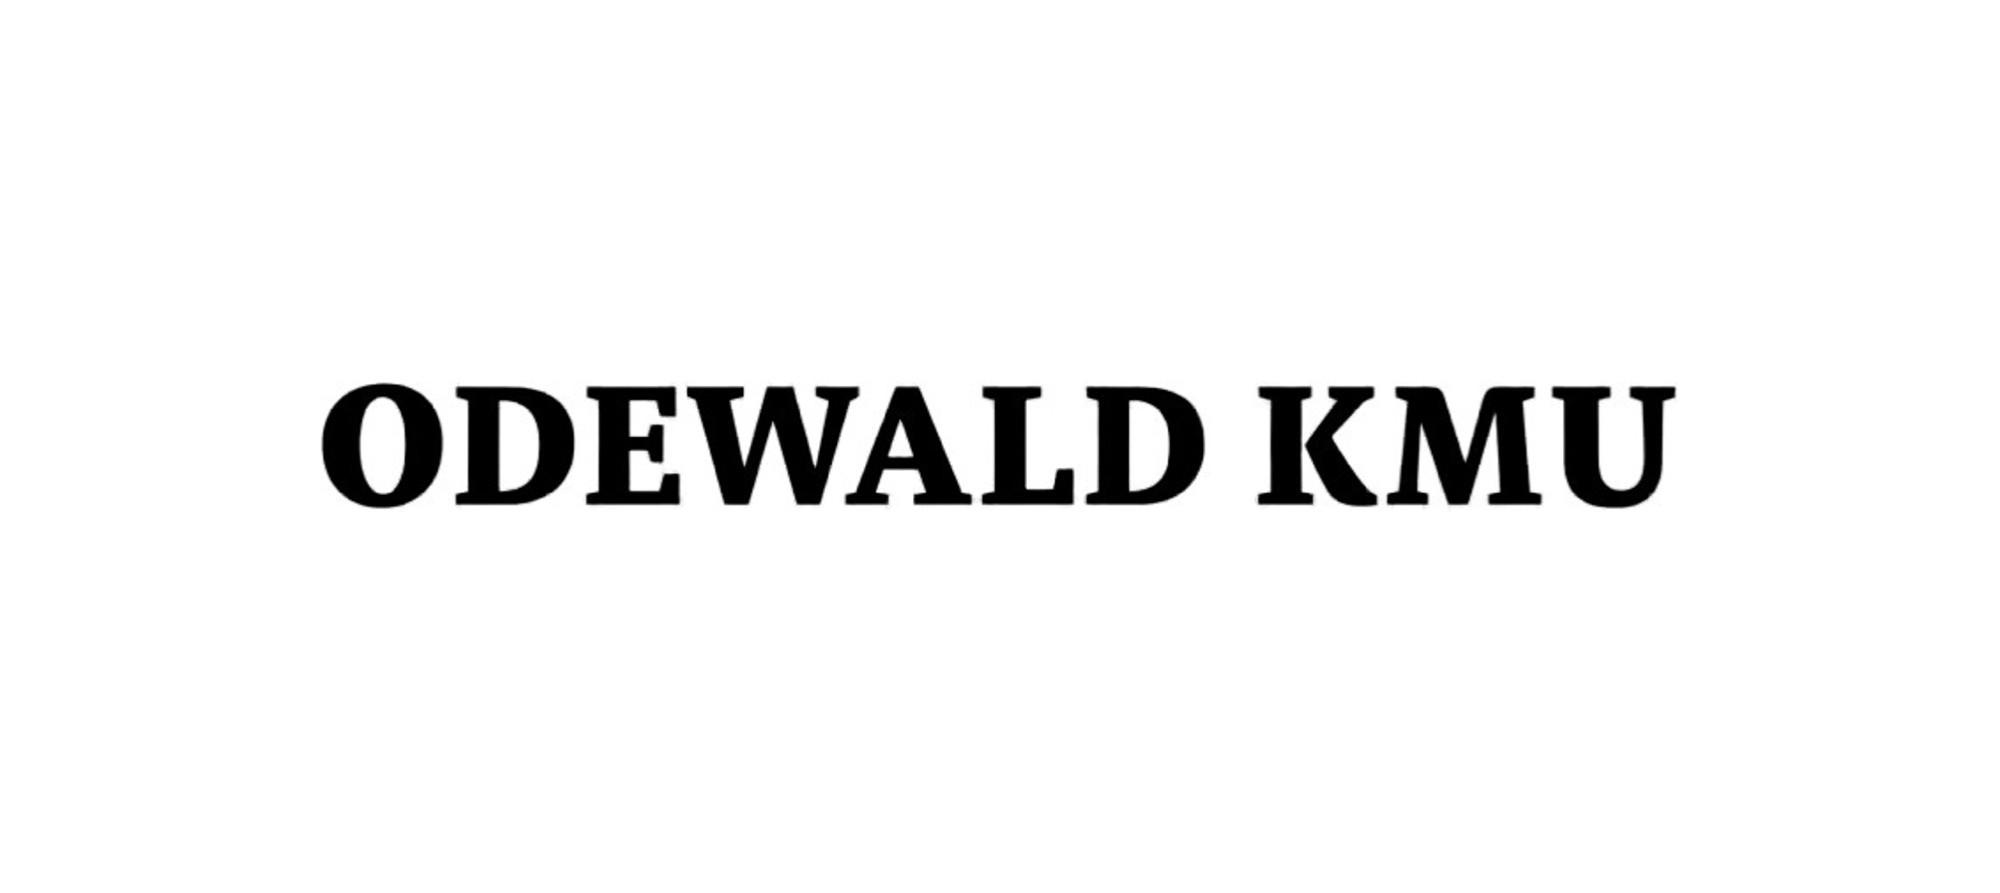 Odewald KMU.jpg